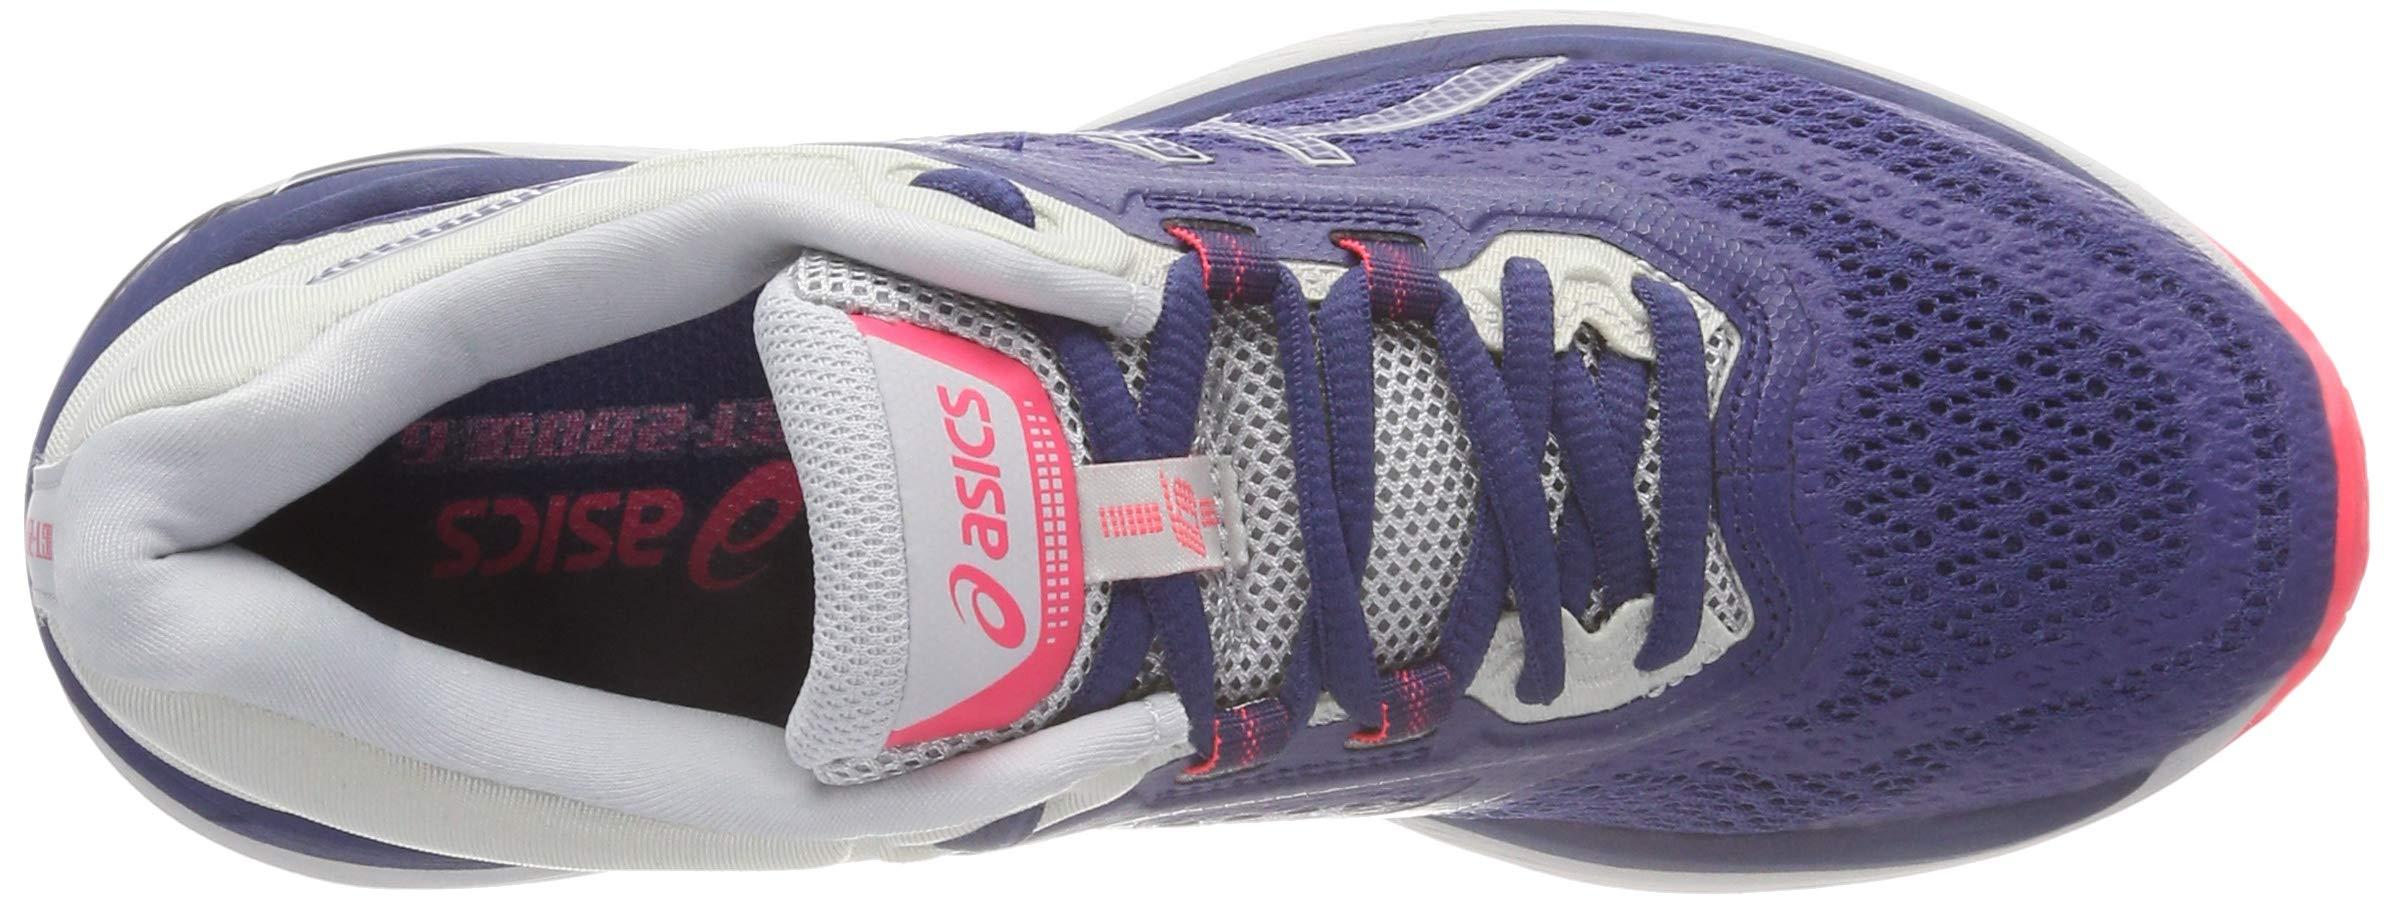 71bA2OYmByL - ASICS Women's Gt-2000 6 Trail Plasmaguard Running Shoes, 11.5 UK